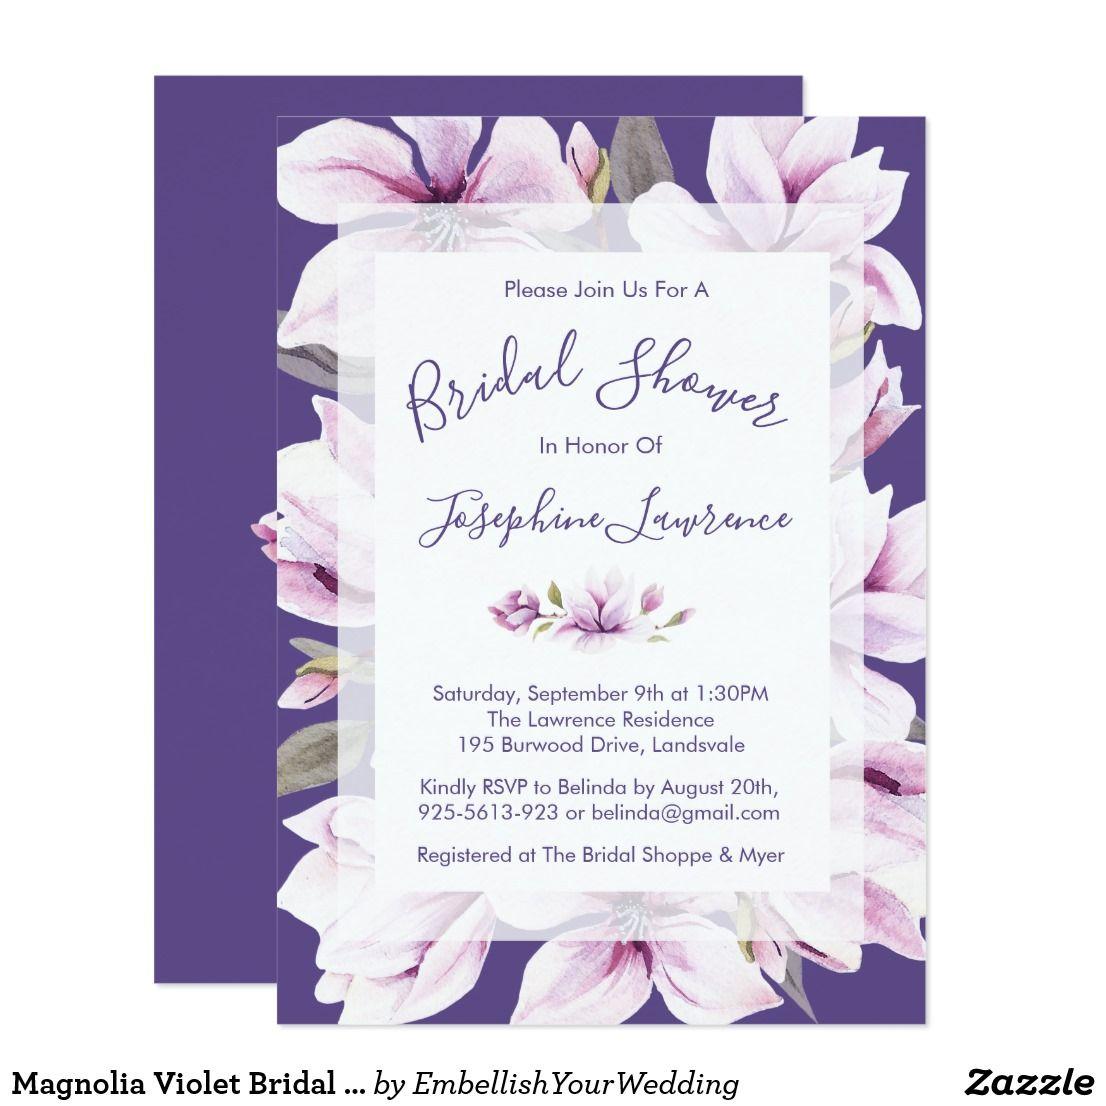 Magnolia violet bridal shower invitation purple wedding succulent ultra violet bridal shower invitation elegant gifts gift ideas custom presents filmwisefo